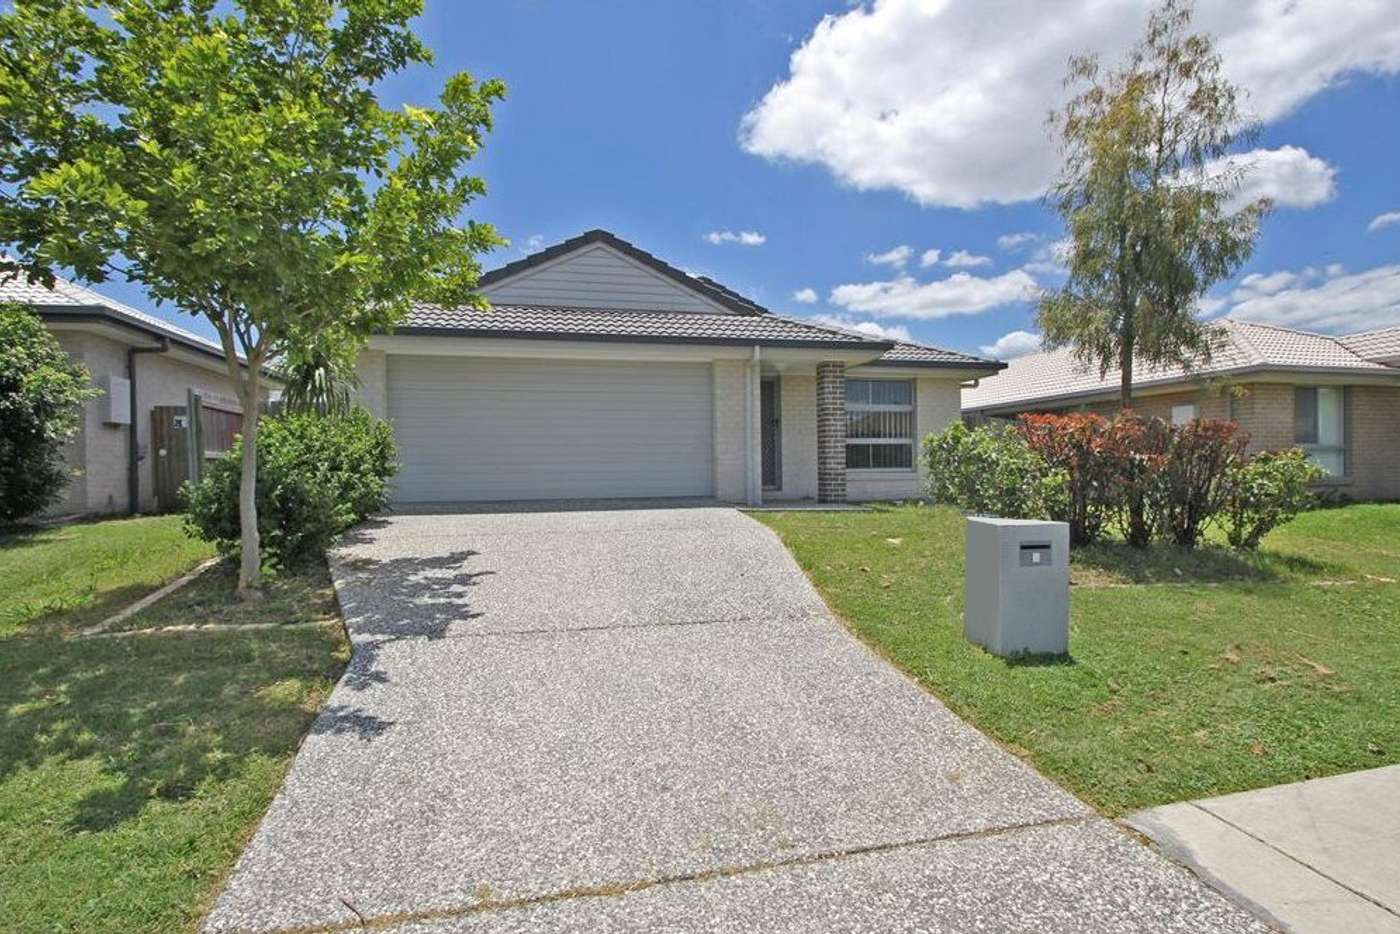 Main view of Homely house listing, 8 Denman Drive, Bundamba QLD 4304